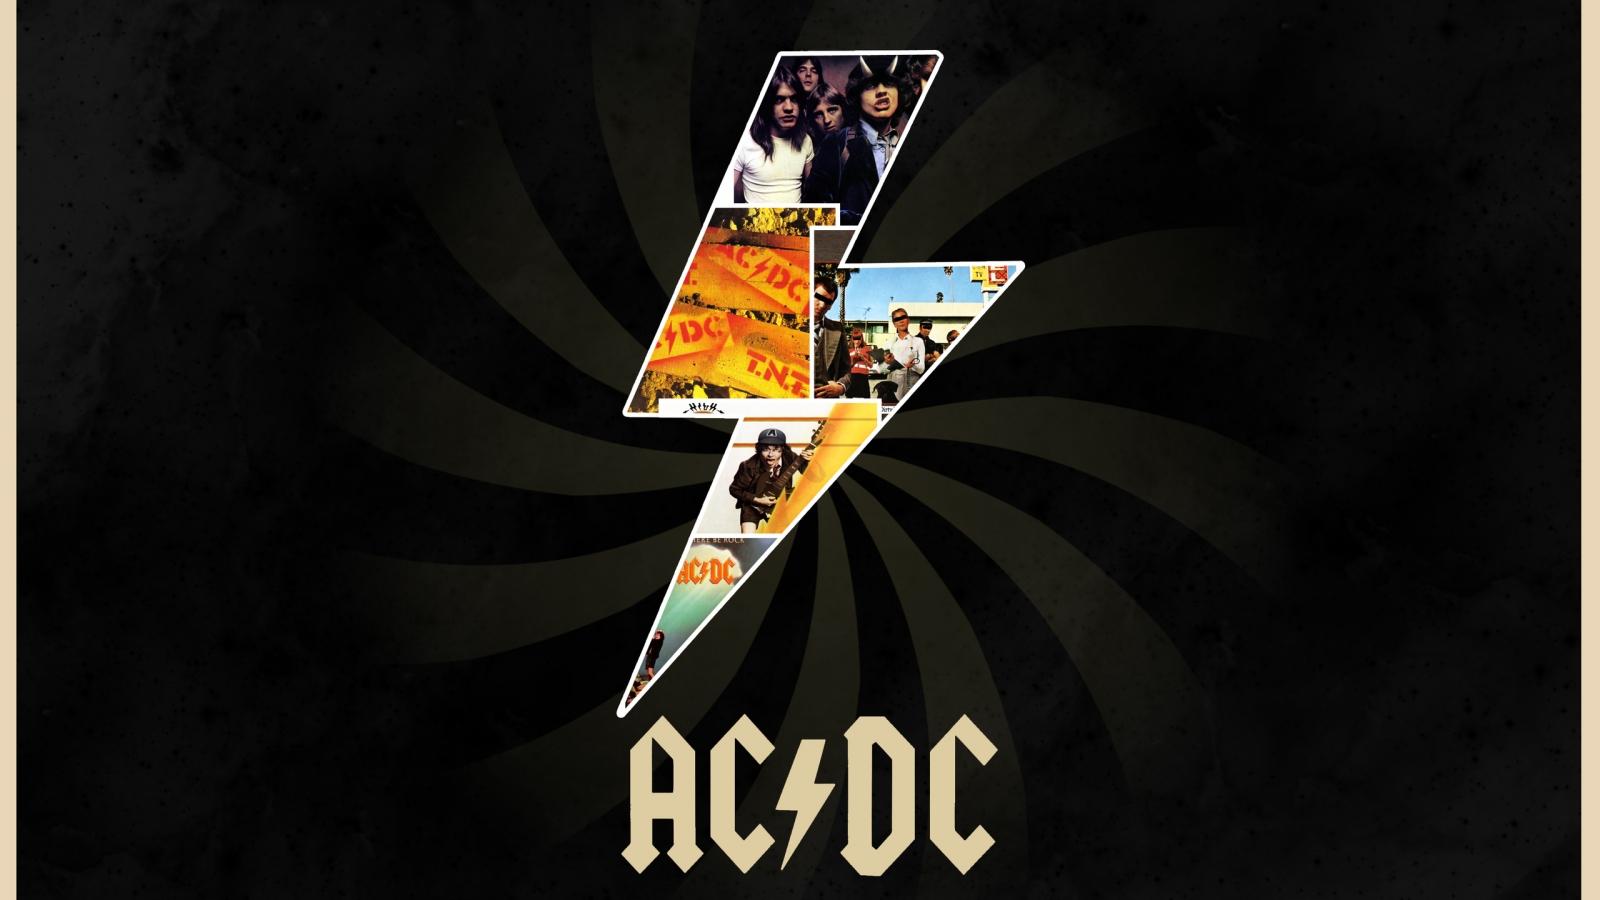 AC / DC Rock - 1600x900